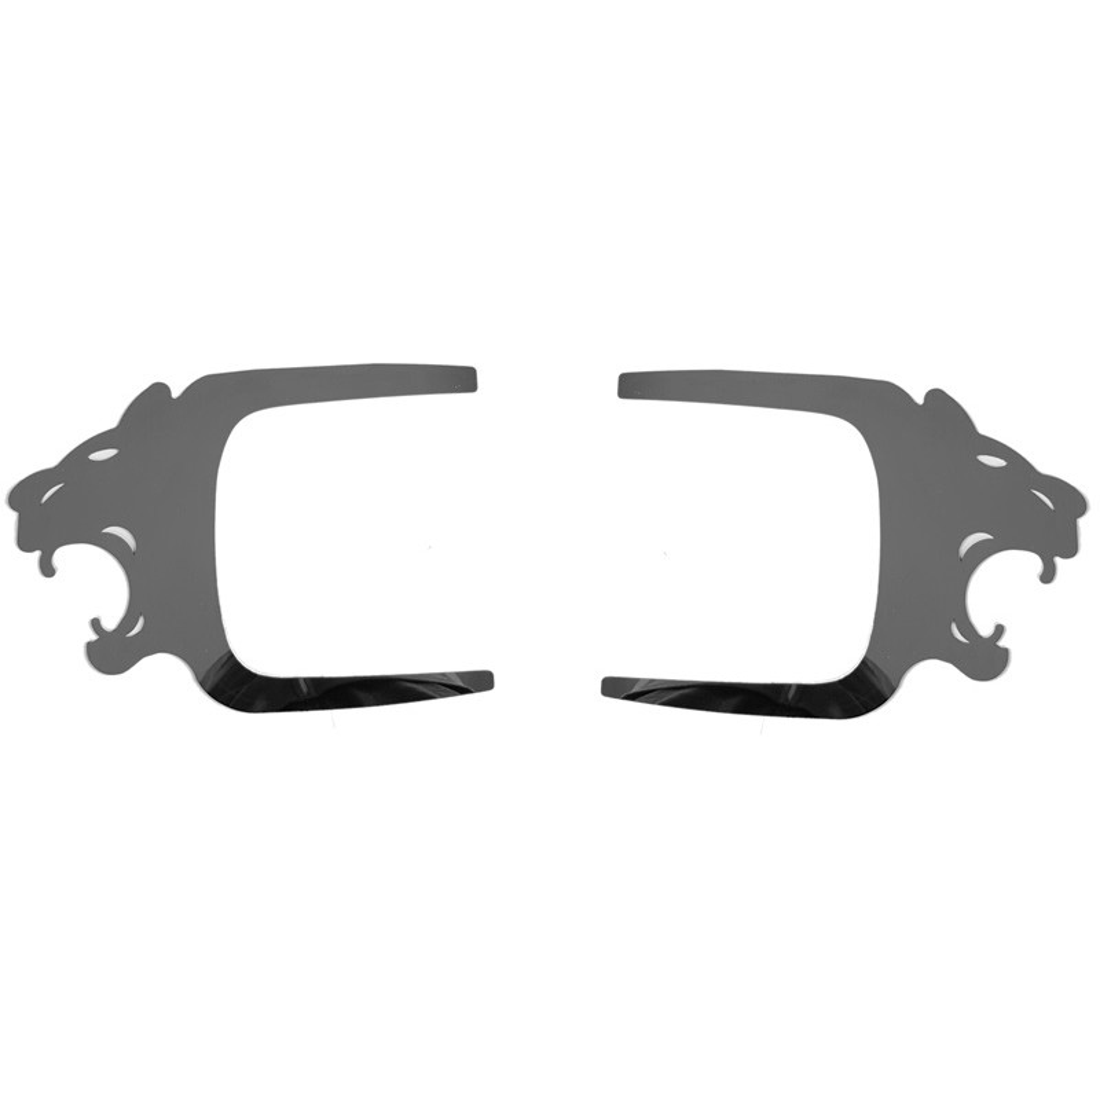 MAN TGX TGA door handle frame stainless steel chrome